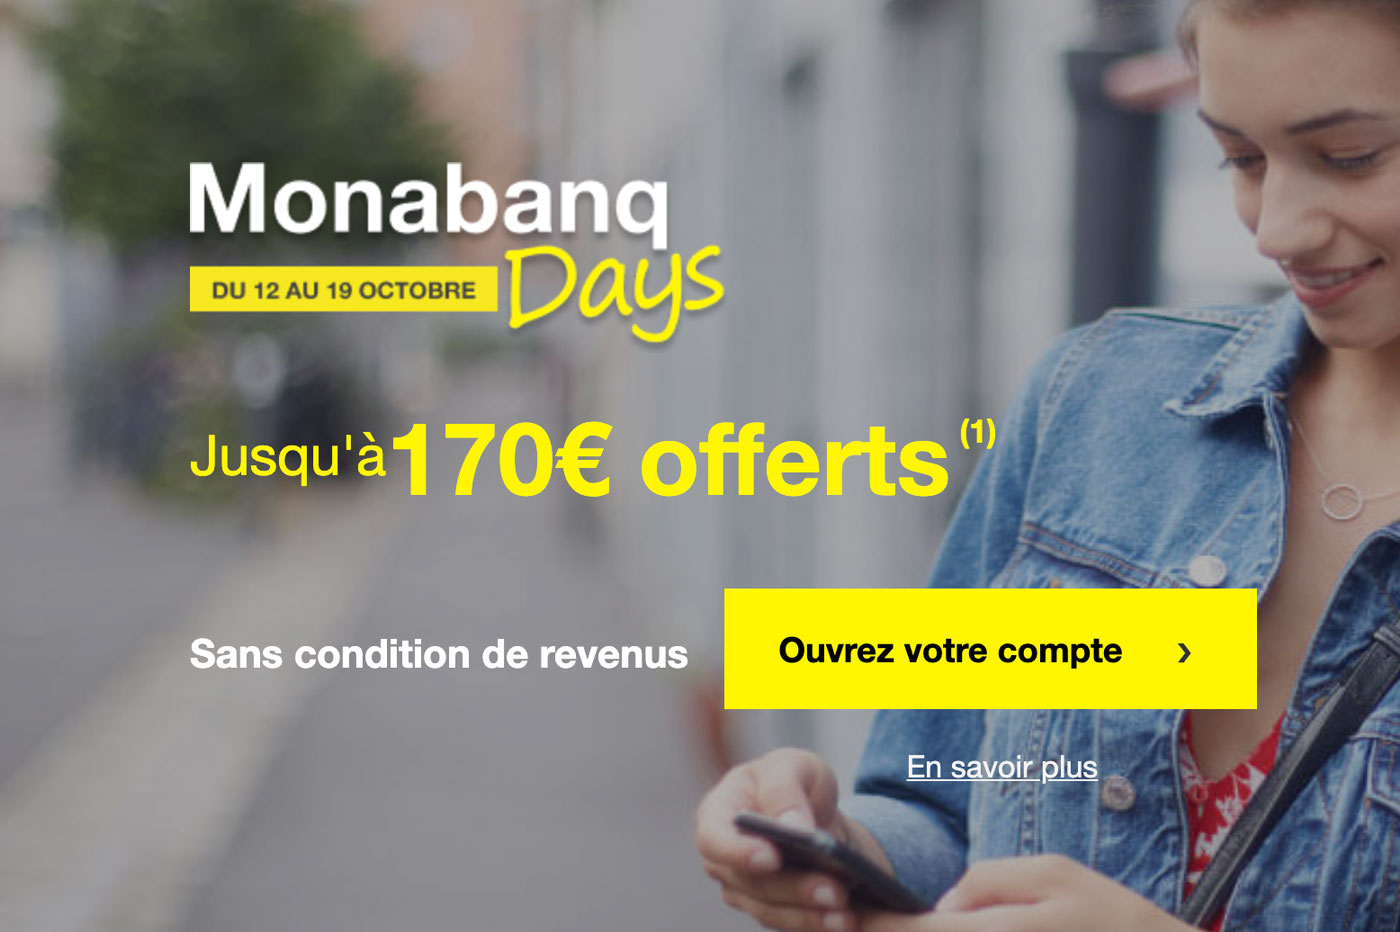 Monabanq Days